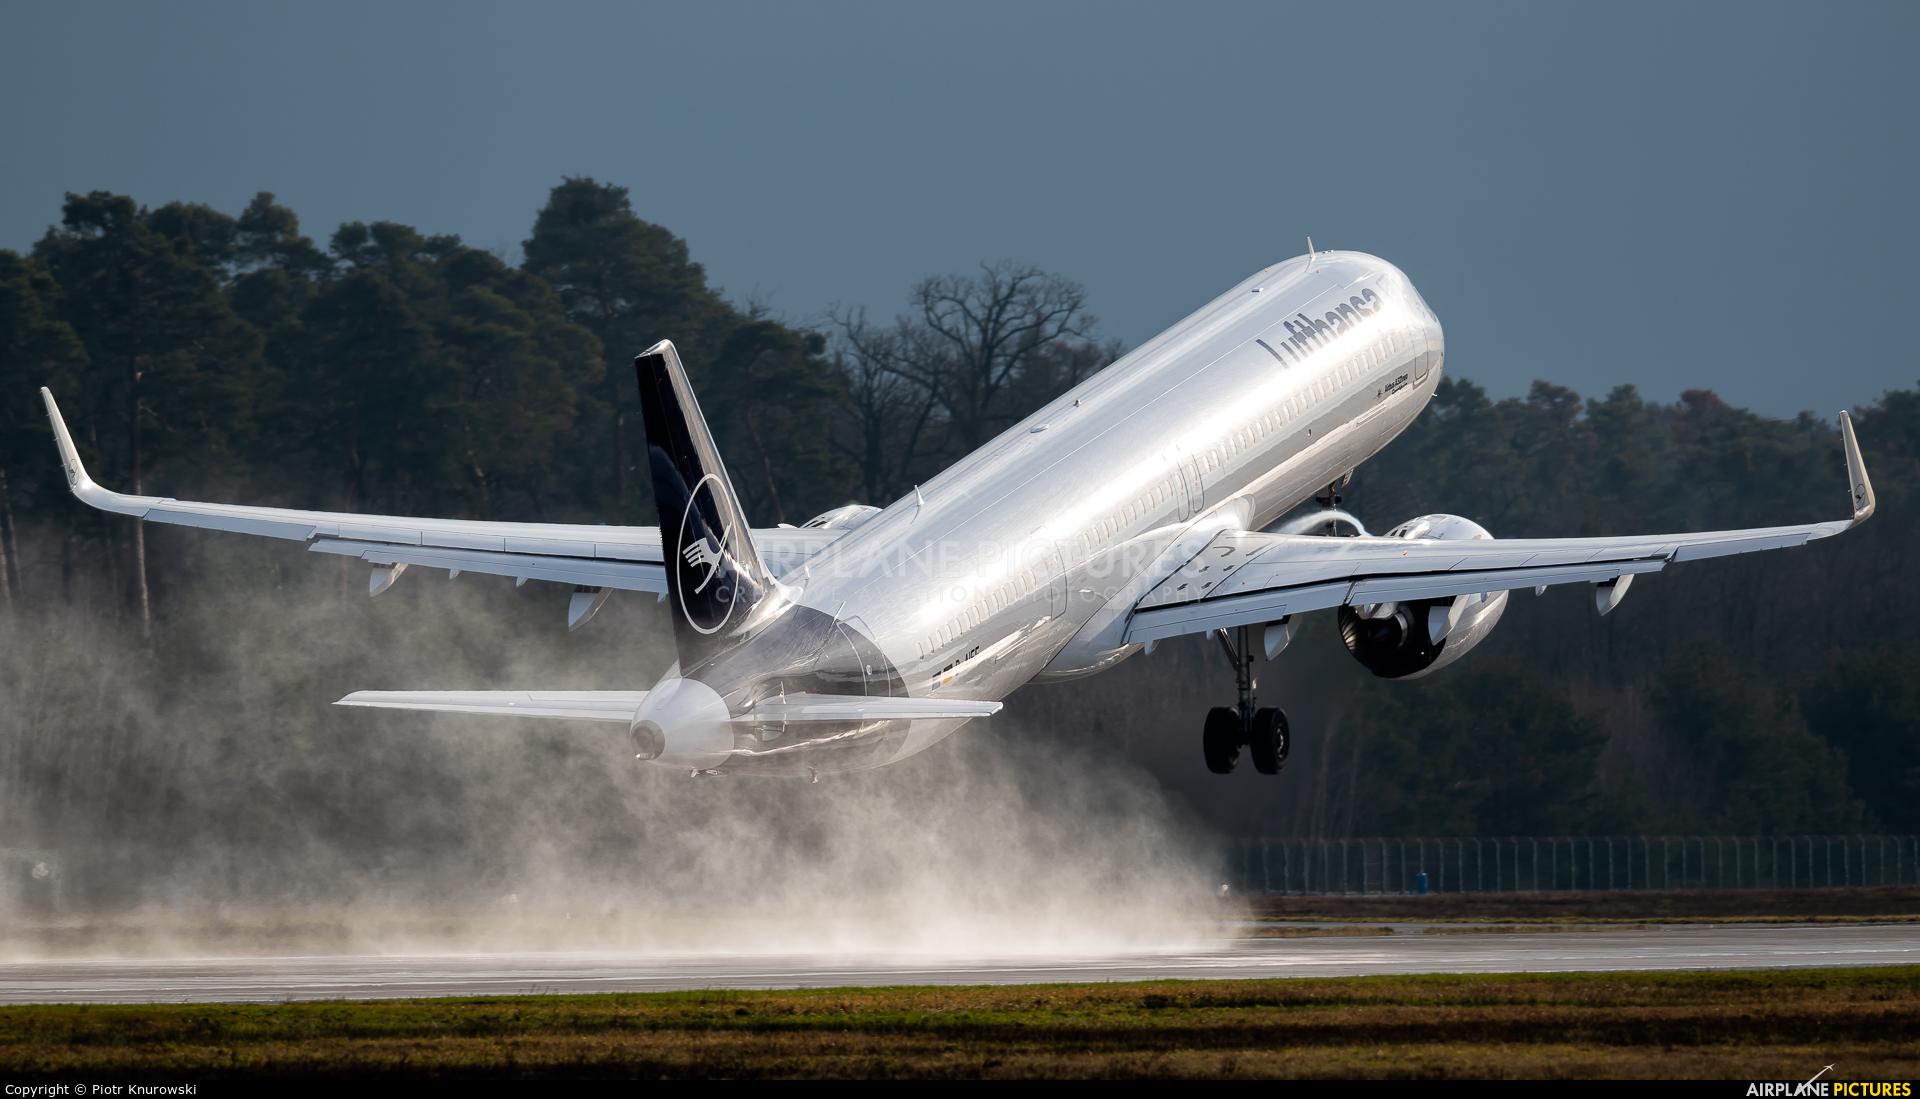 Lufthansa D-AIEF aircraft at Frankfurt